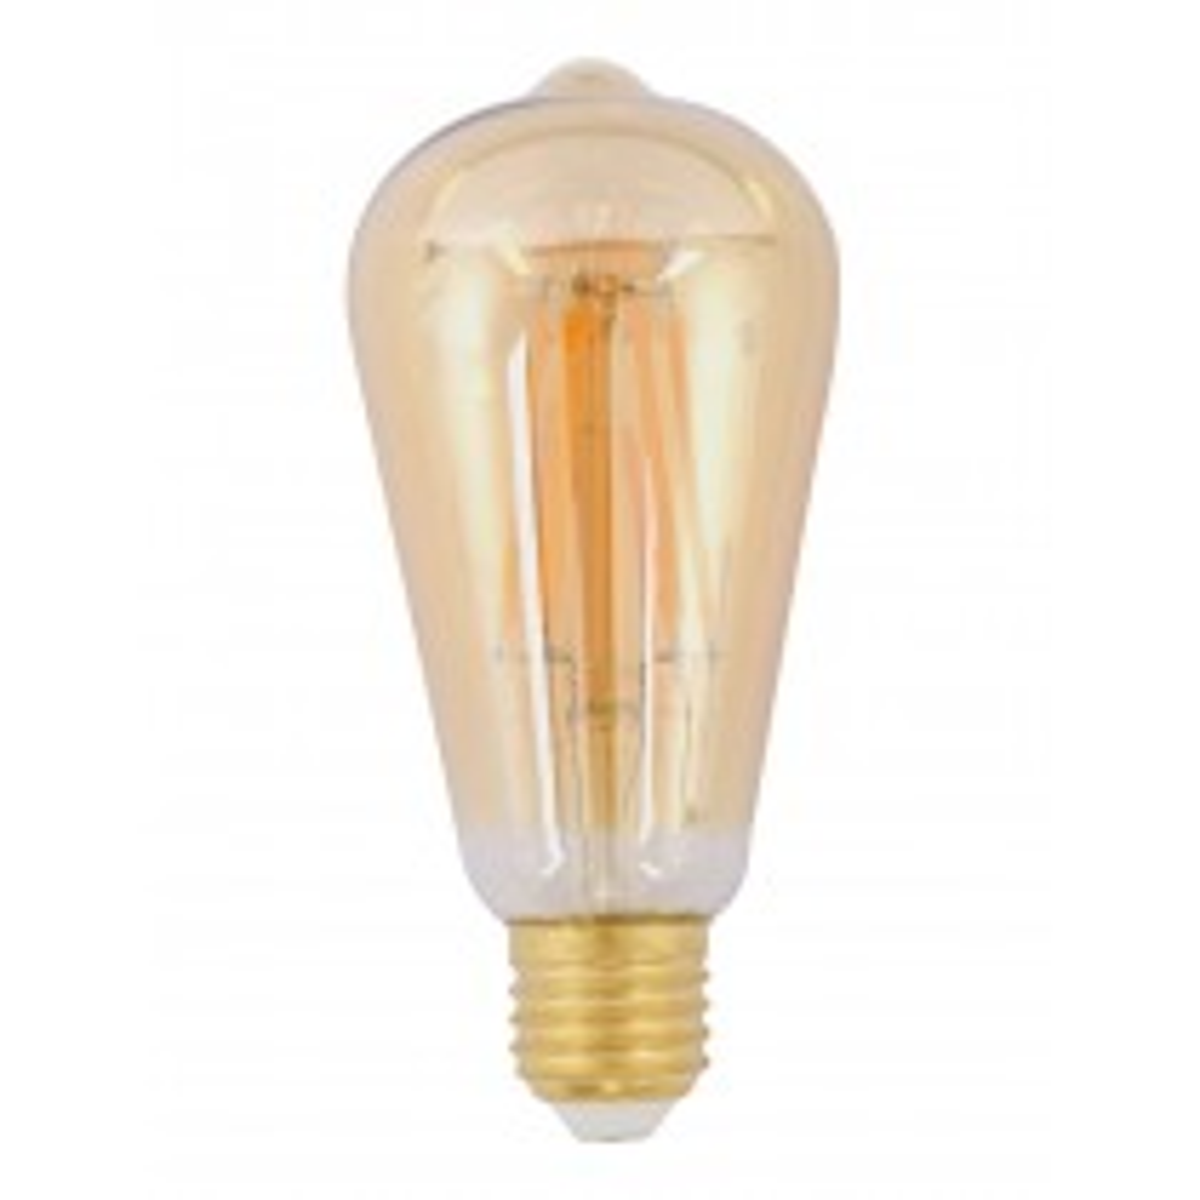 GE LED Bulb Heritage Pilot 7.5 Watt ES DIM Warm White